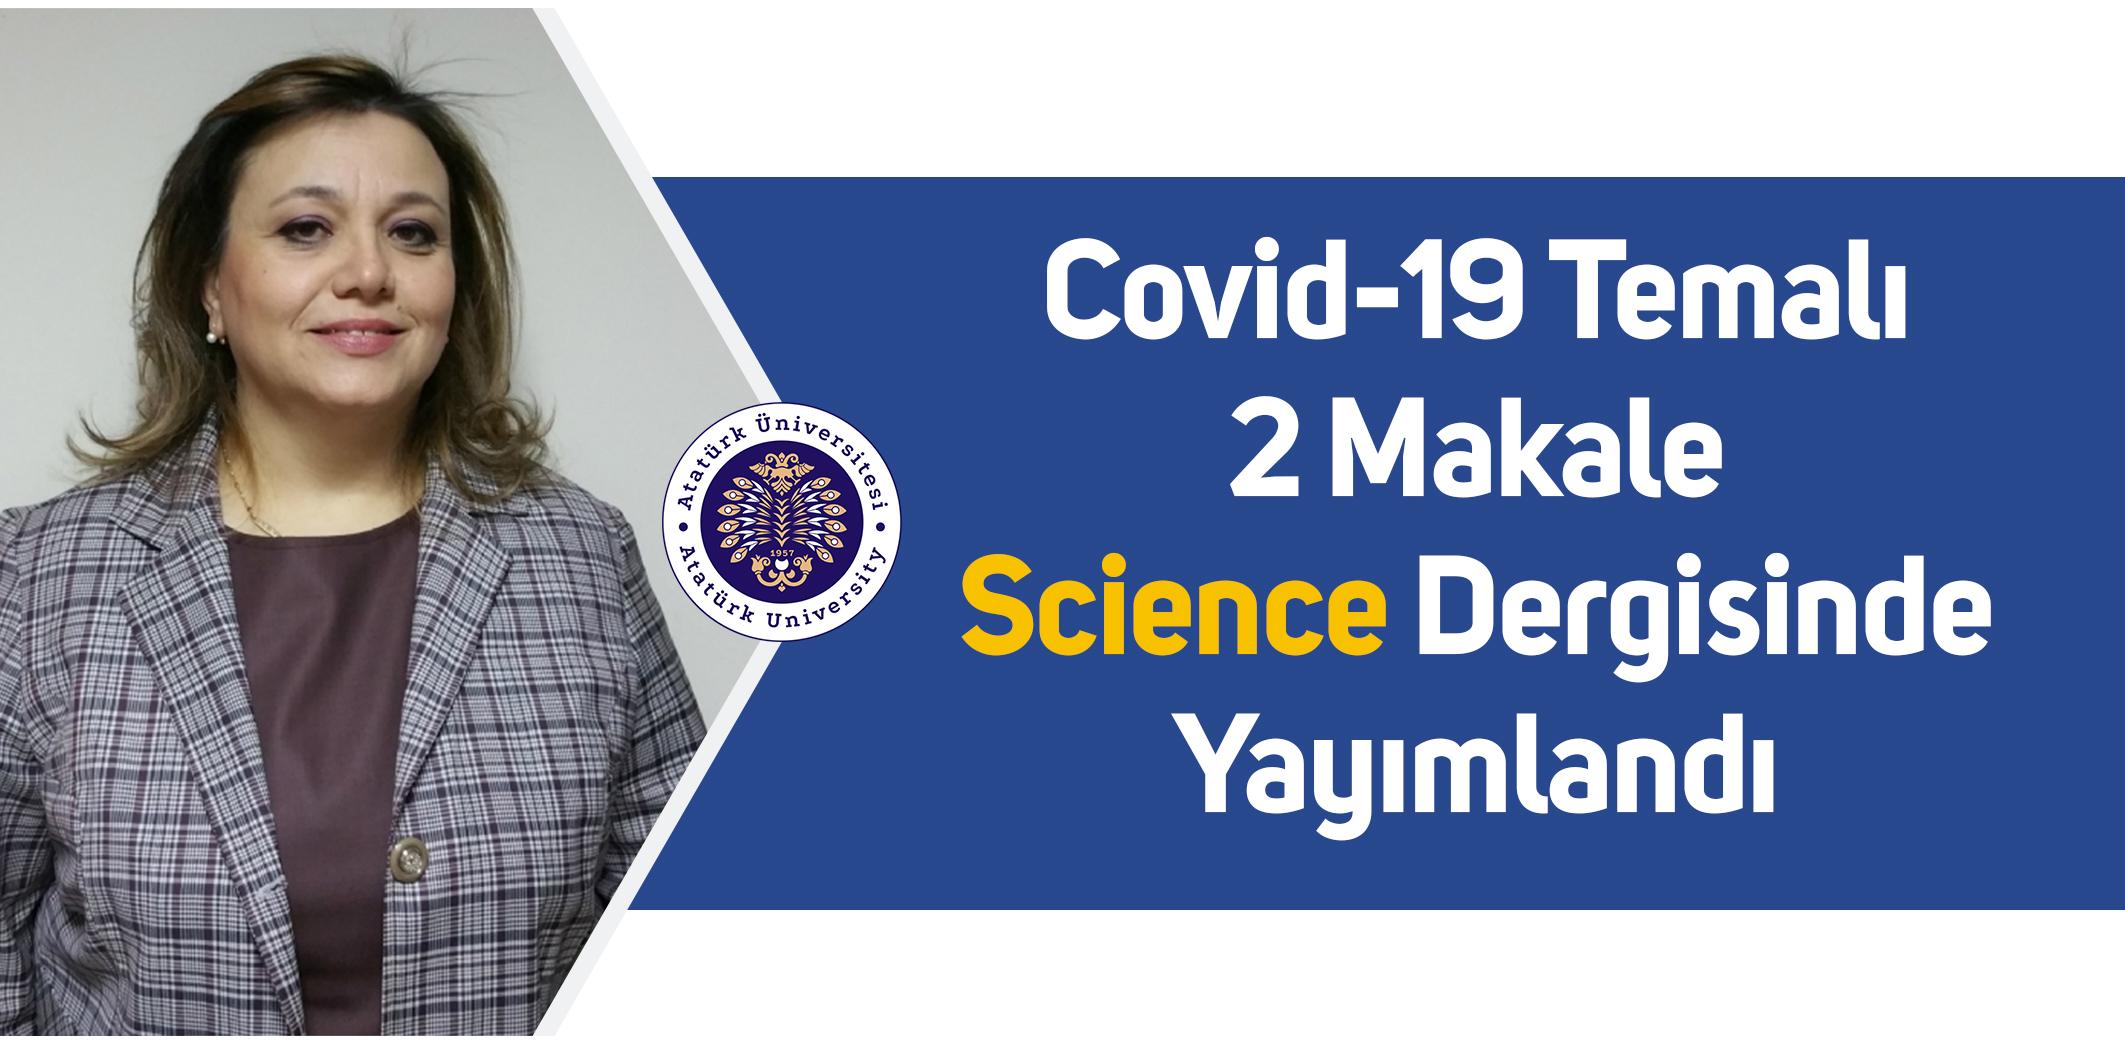 COVİD-19 TEMALI 2 MAKALE SCİENCE DERGİSİNDE YAYIMLANDI